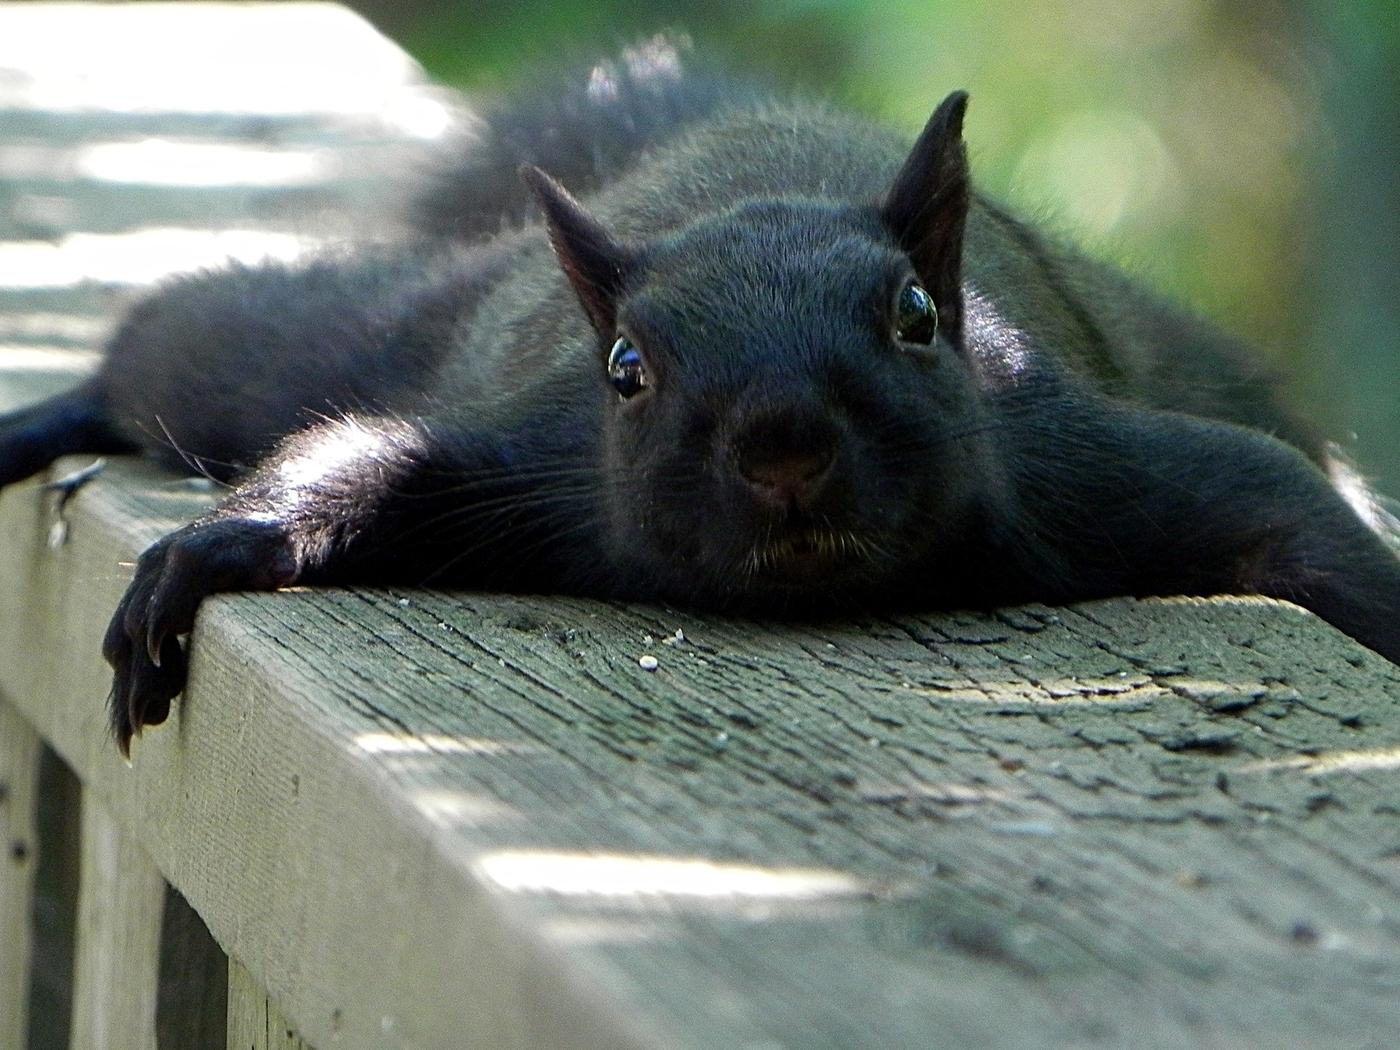 Animals funny squirrels (1400x1050)